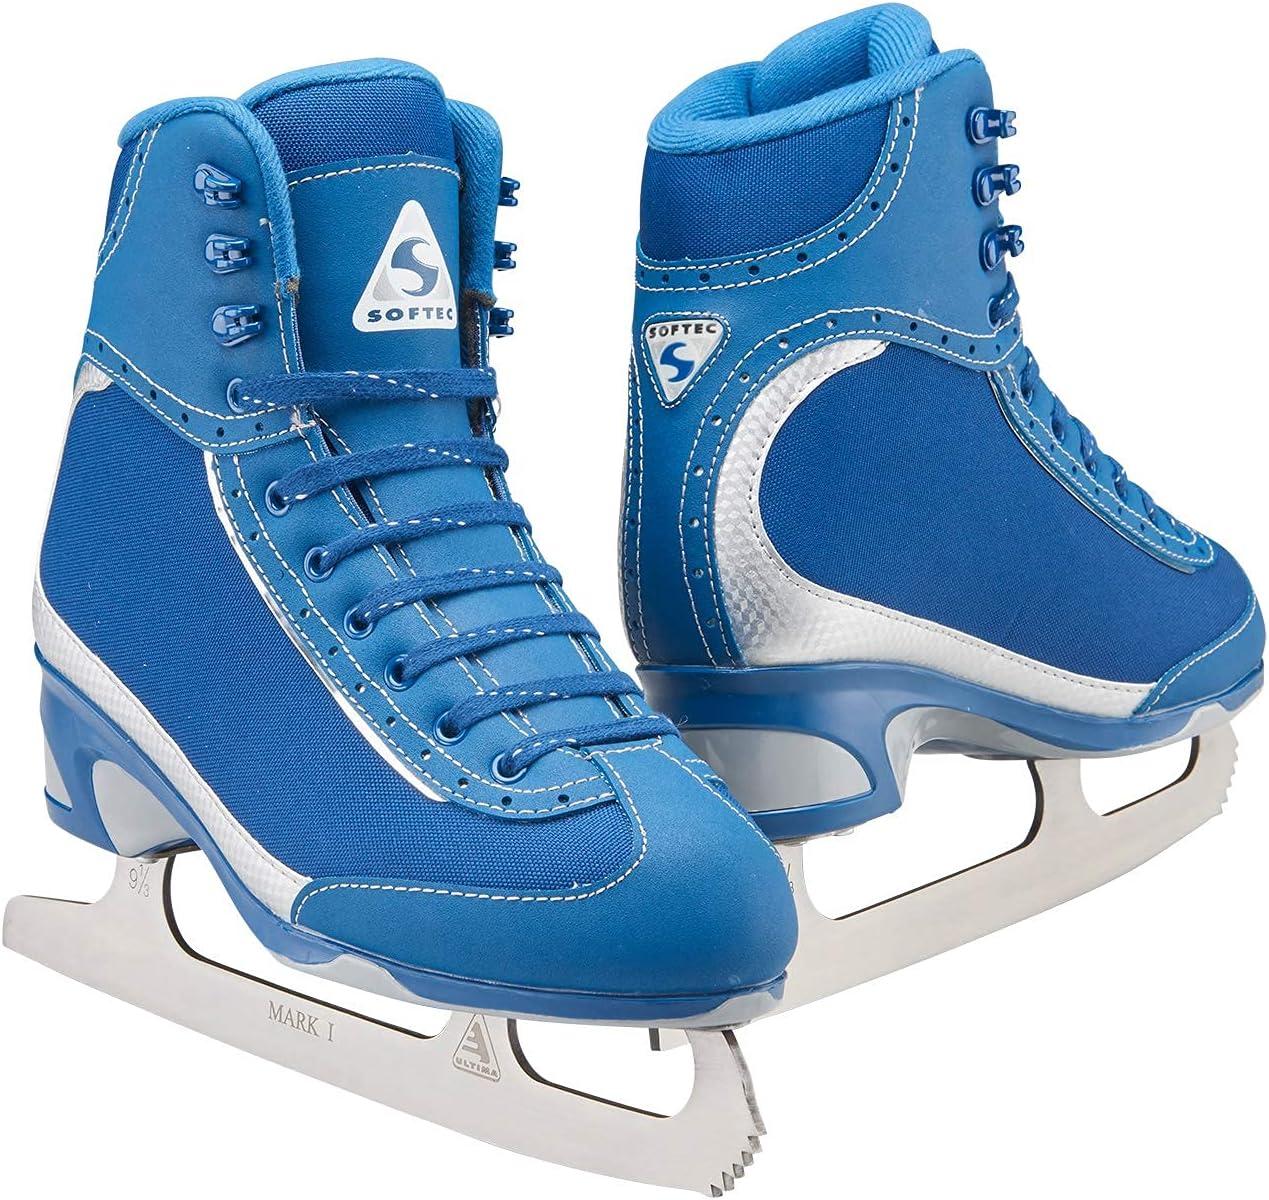 Jackson Ultima Softec Vista Skates Sales for sale Max 72% OFF Women's Figure Girls